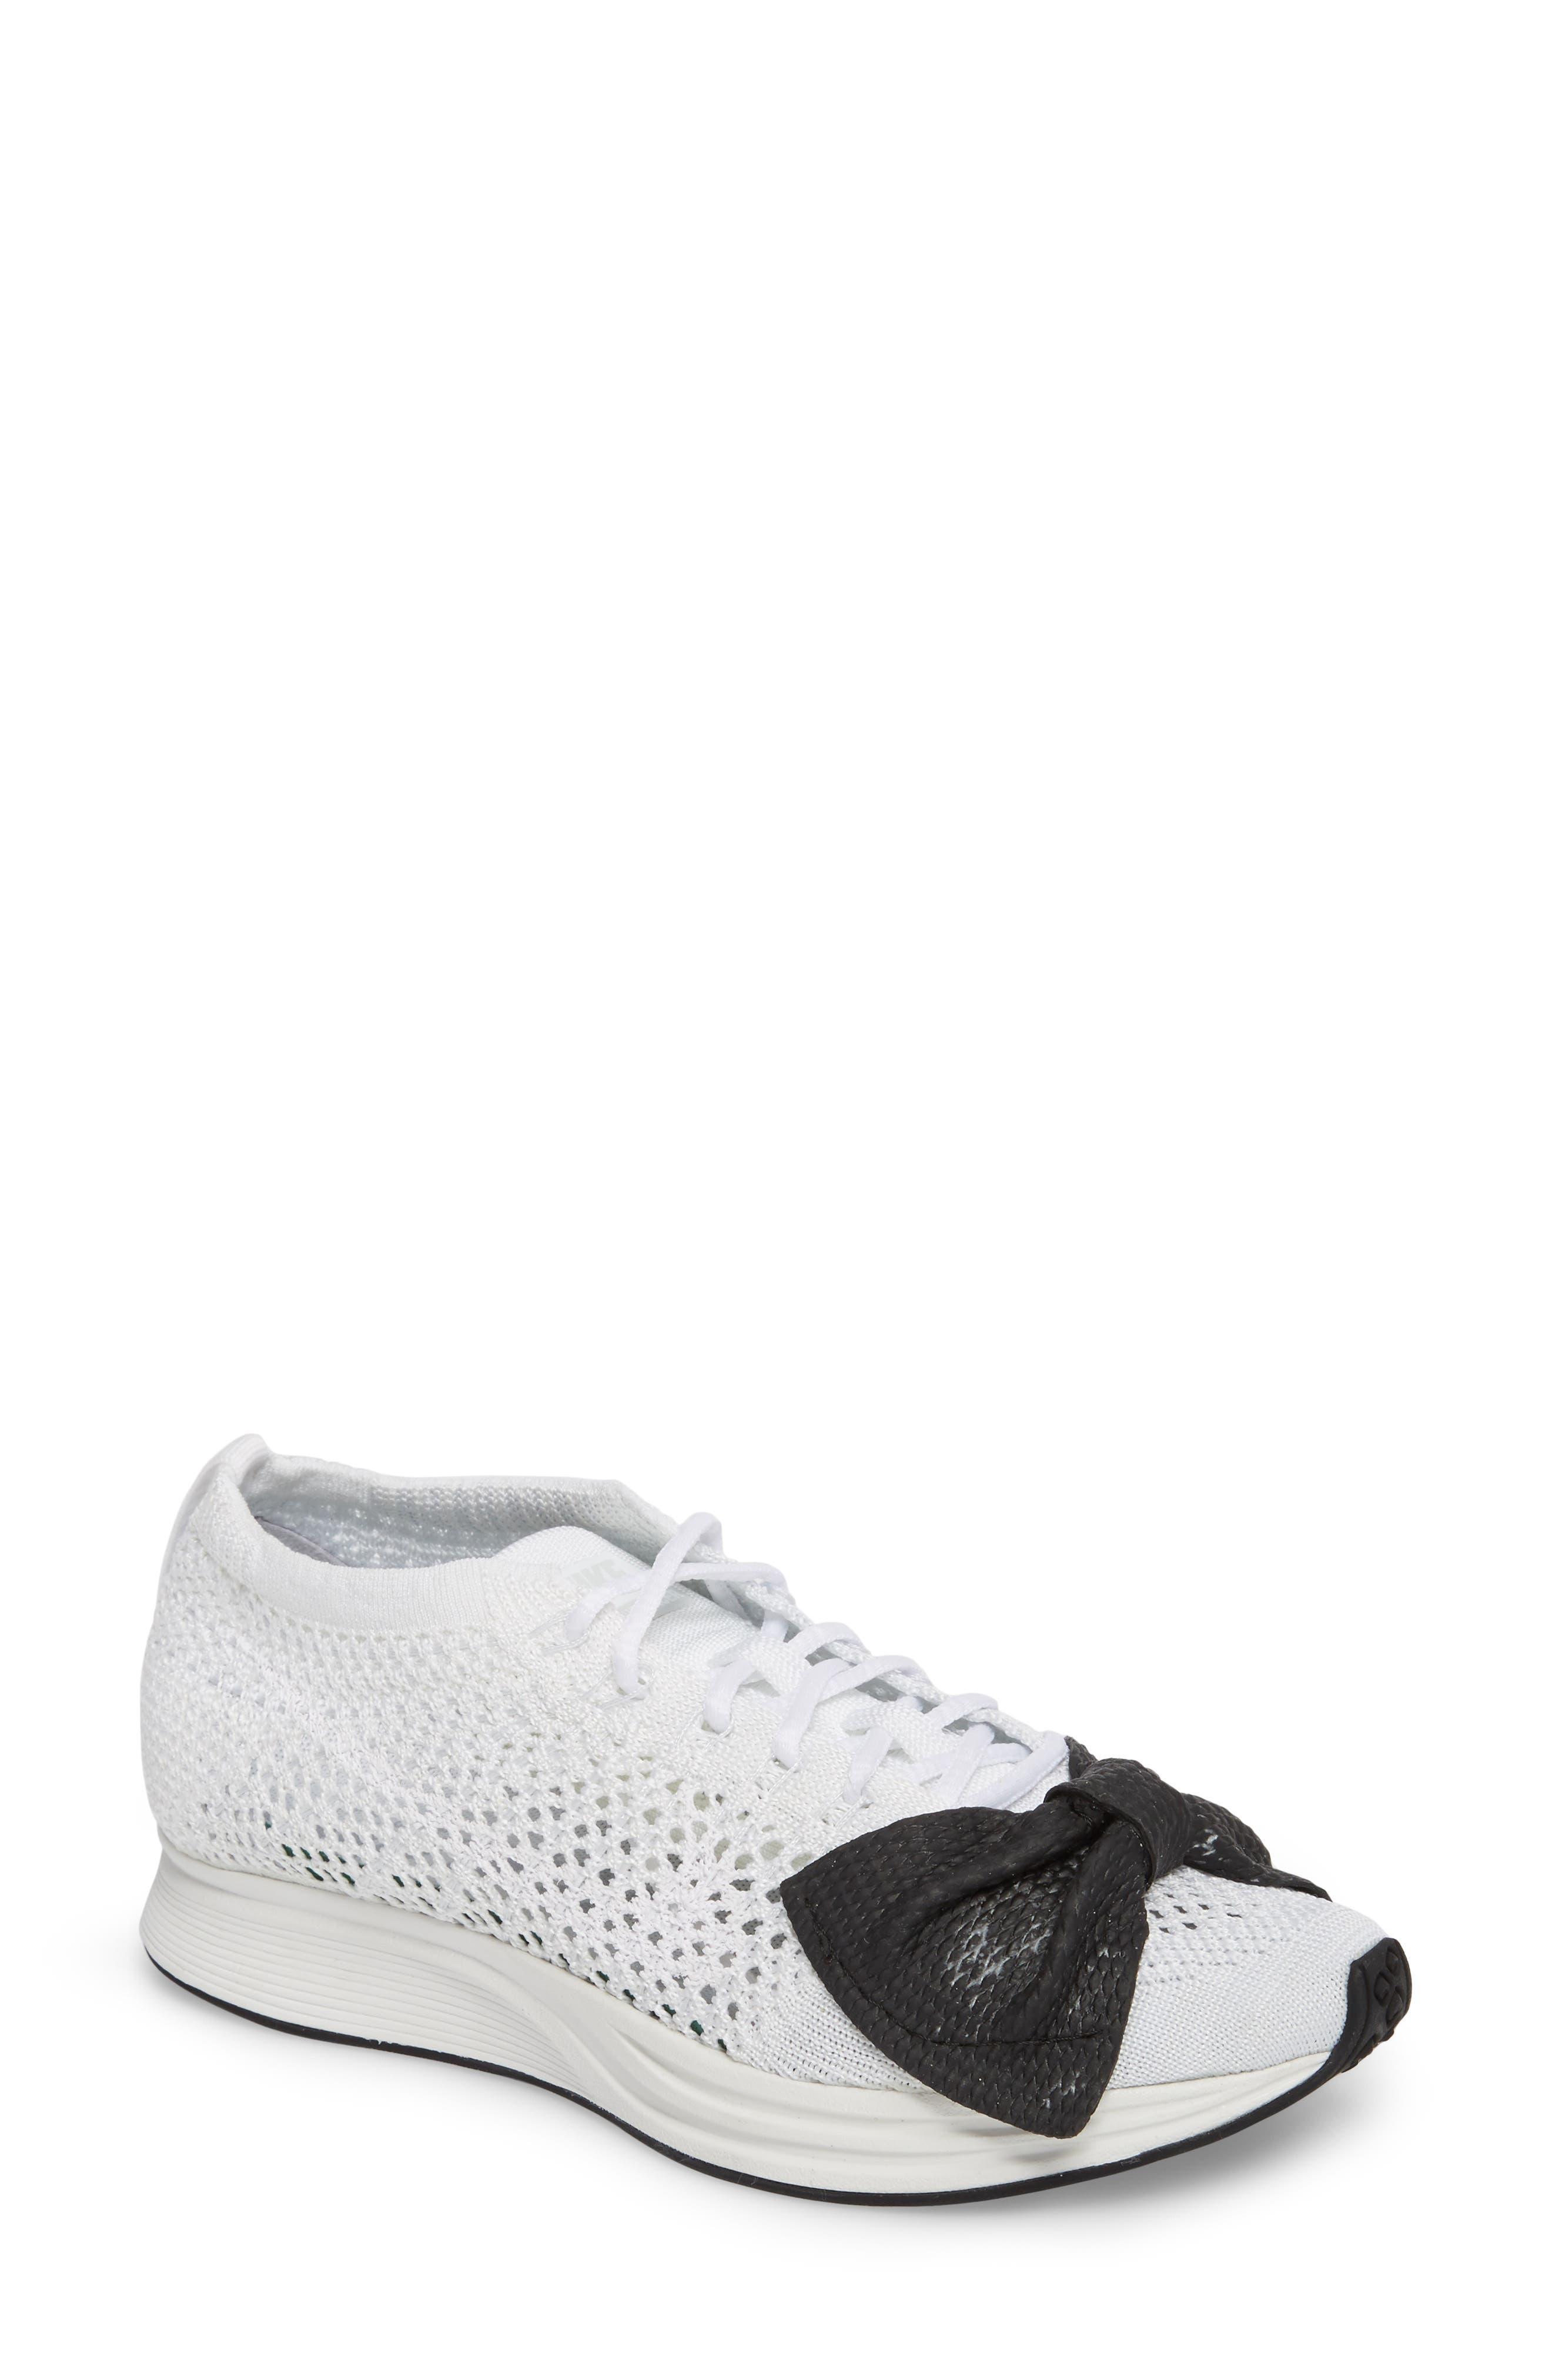 x Nike Bow Flyknit Racer Sneaker,                             Main thumbnail 1, color,                             101